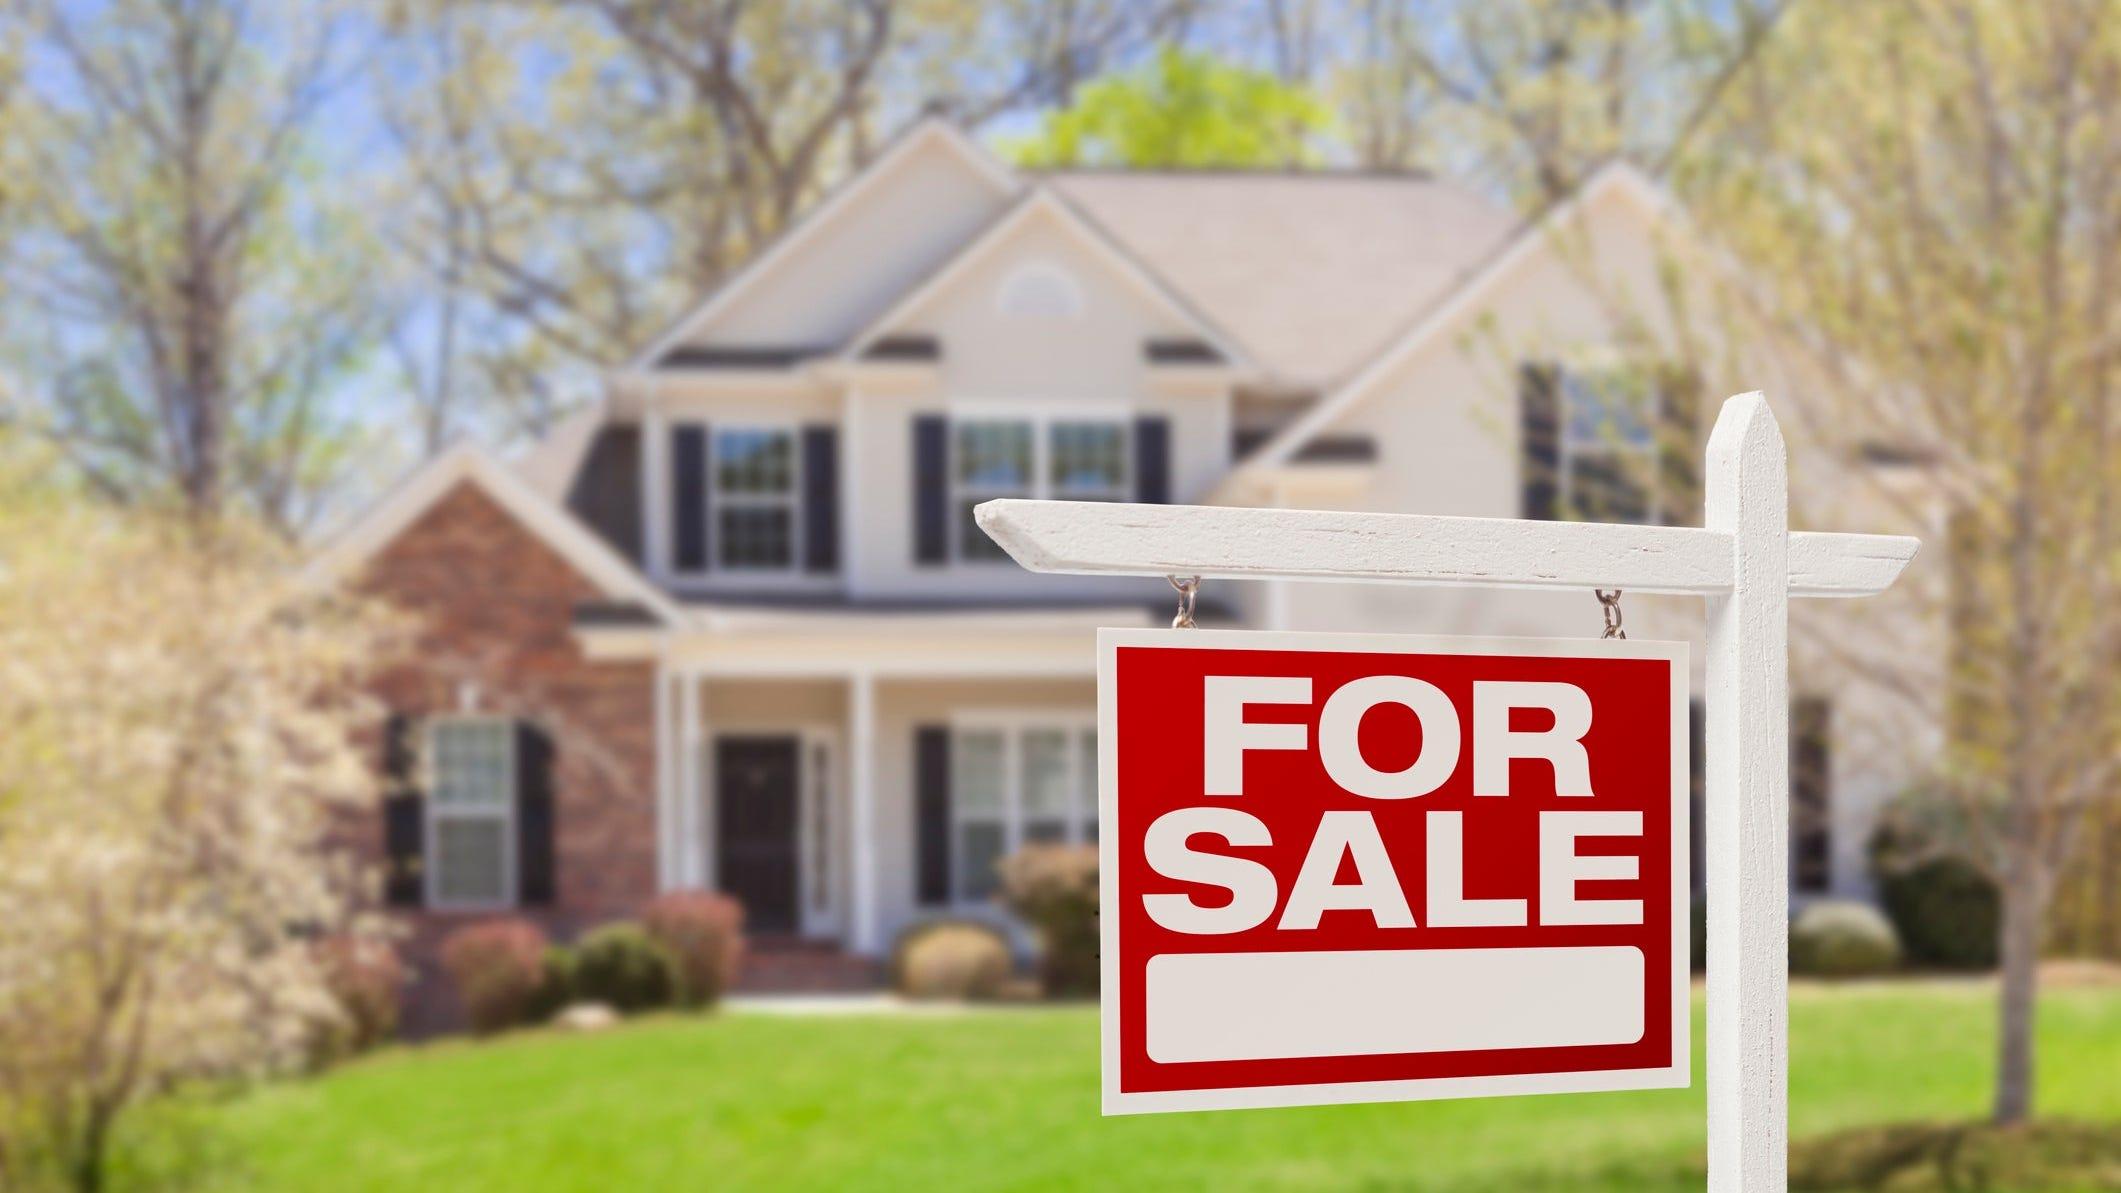 Homebuyers Look For Certain Qualities When Choosing A Neighborhood